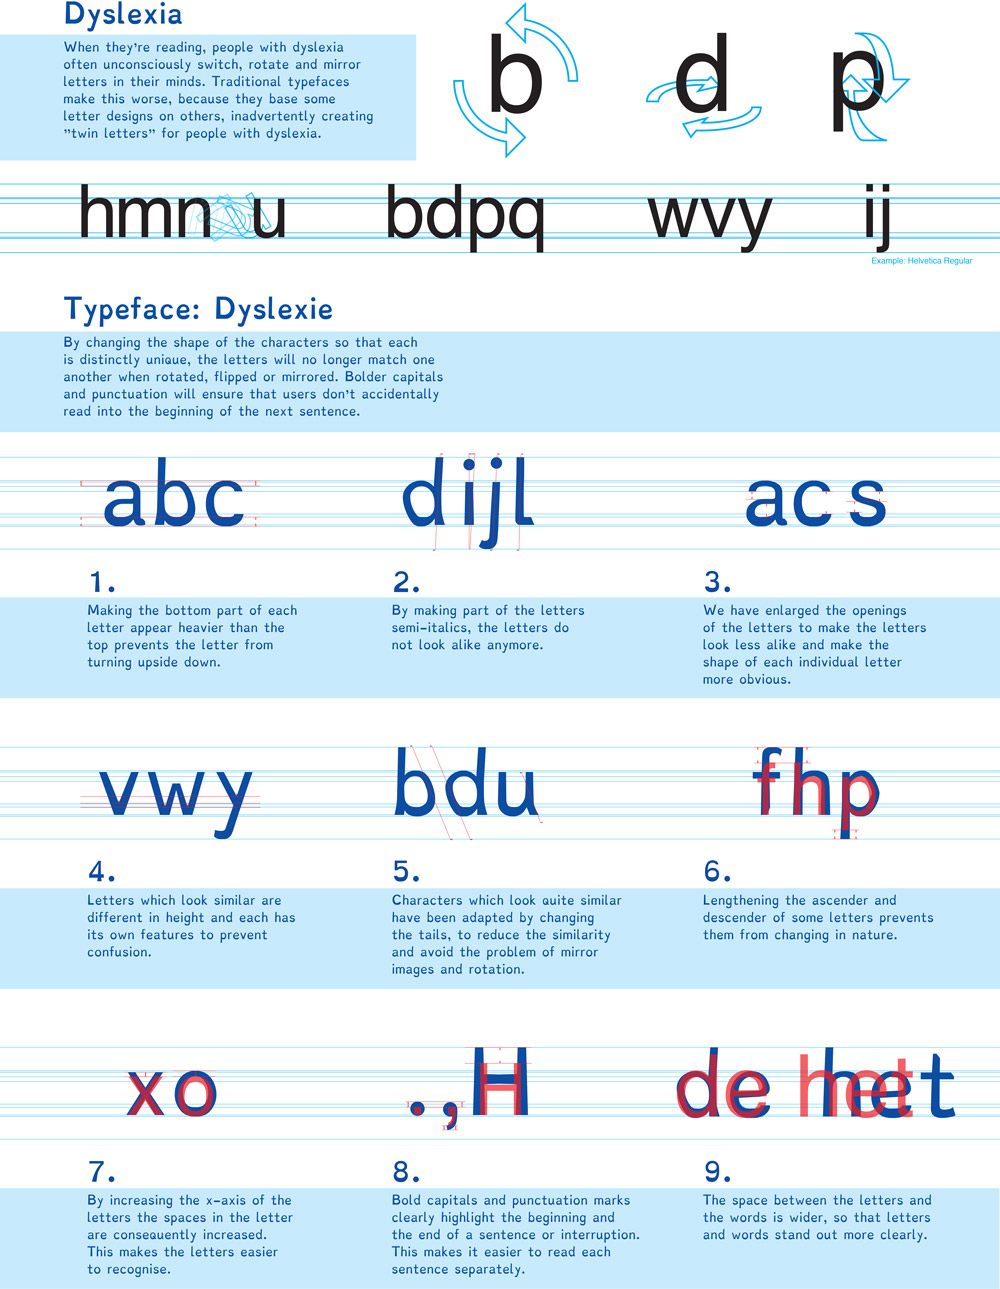 Dyslexie-typeface-by-Christian-Boer-dezeen_468_2_1000